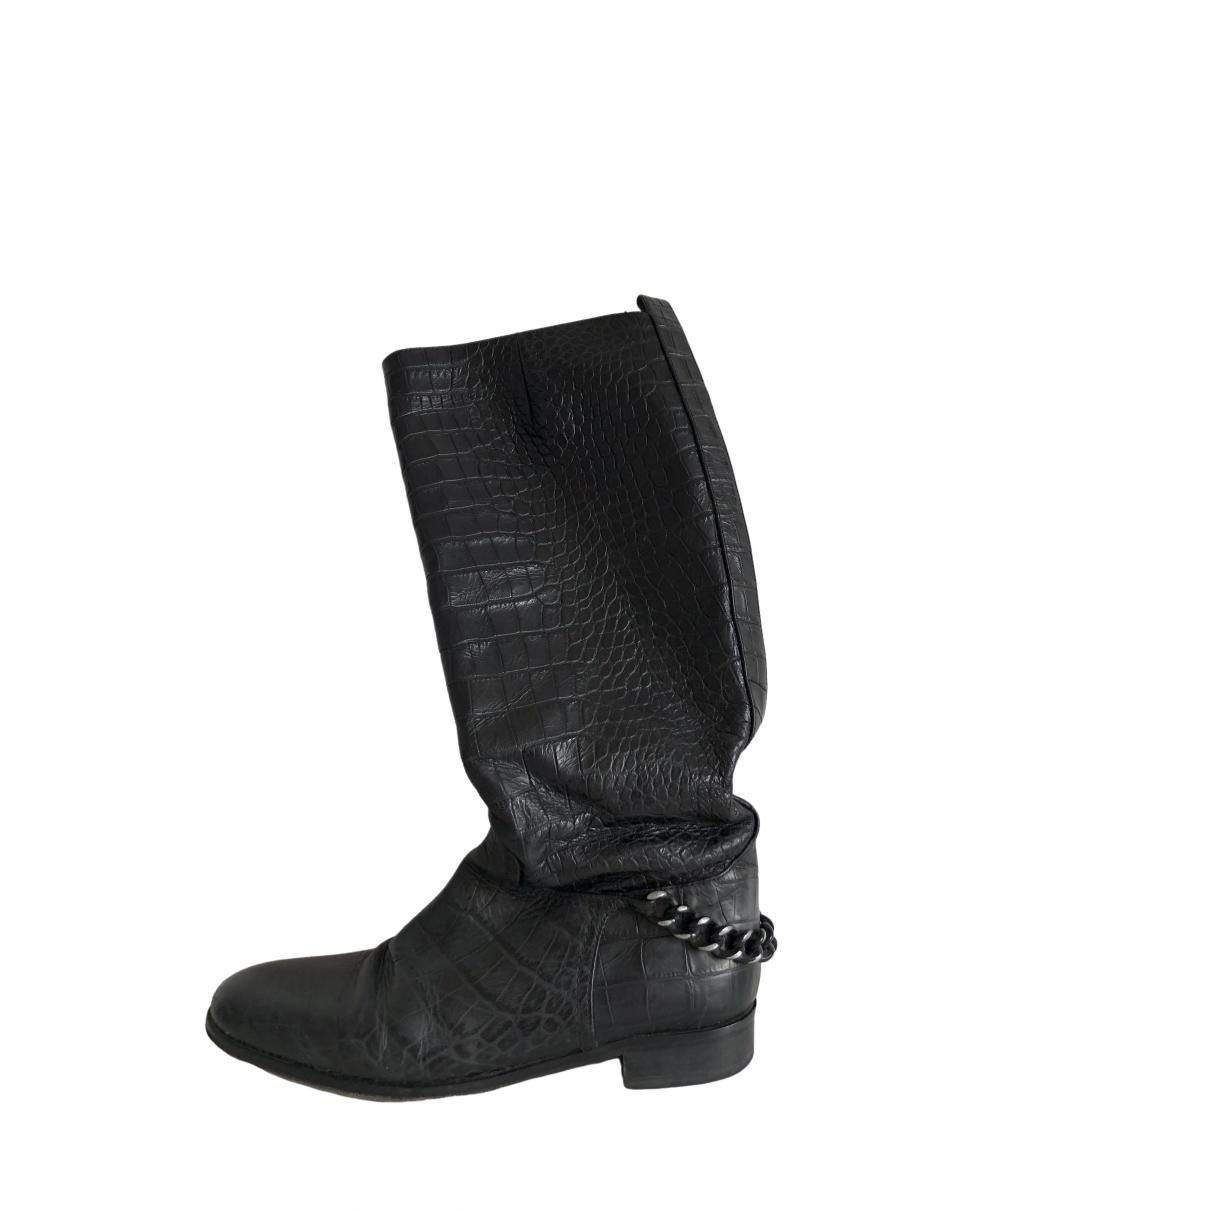 Patrizia Pepe \N Black Leather Boots for Women 39 EU